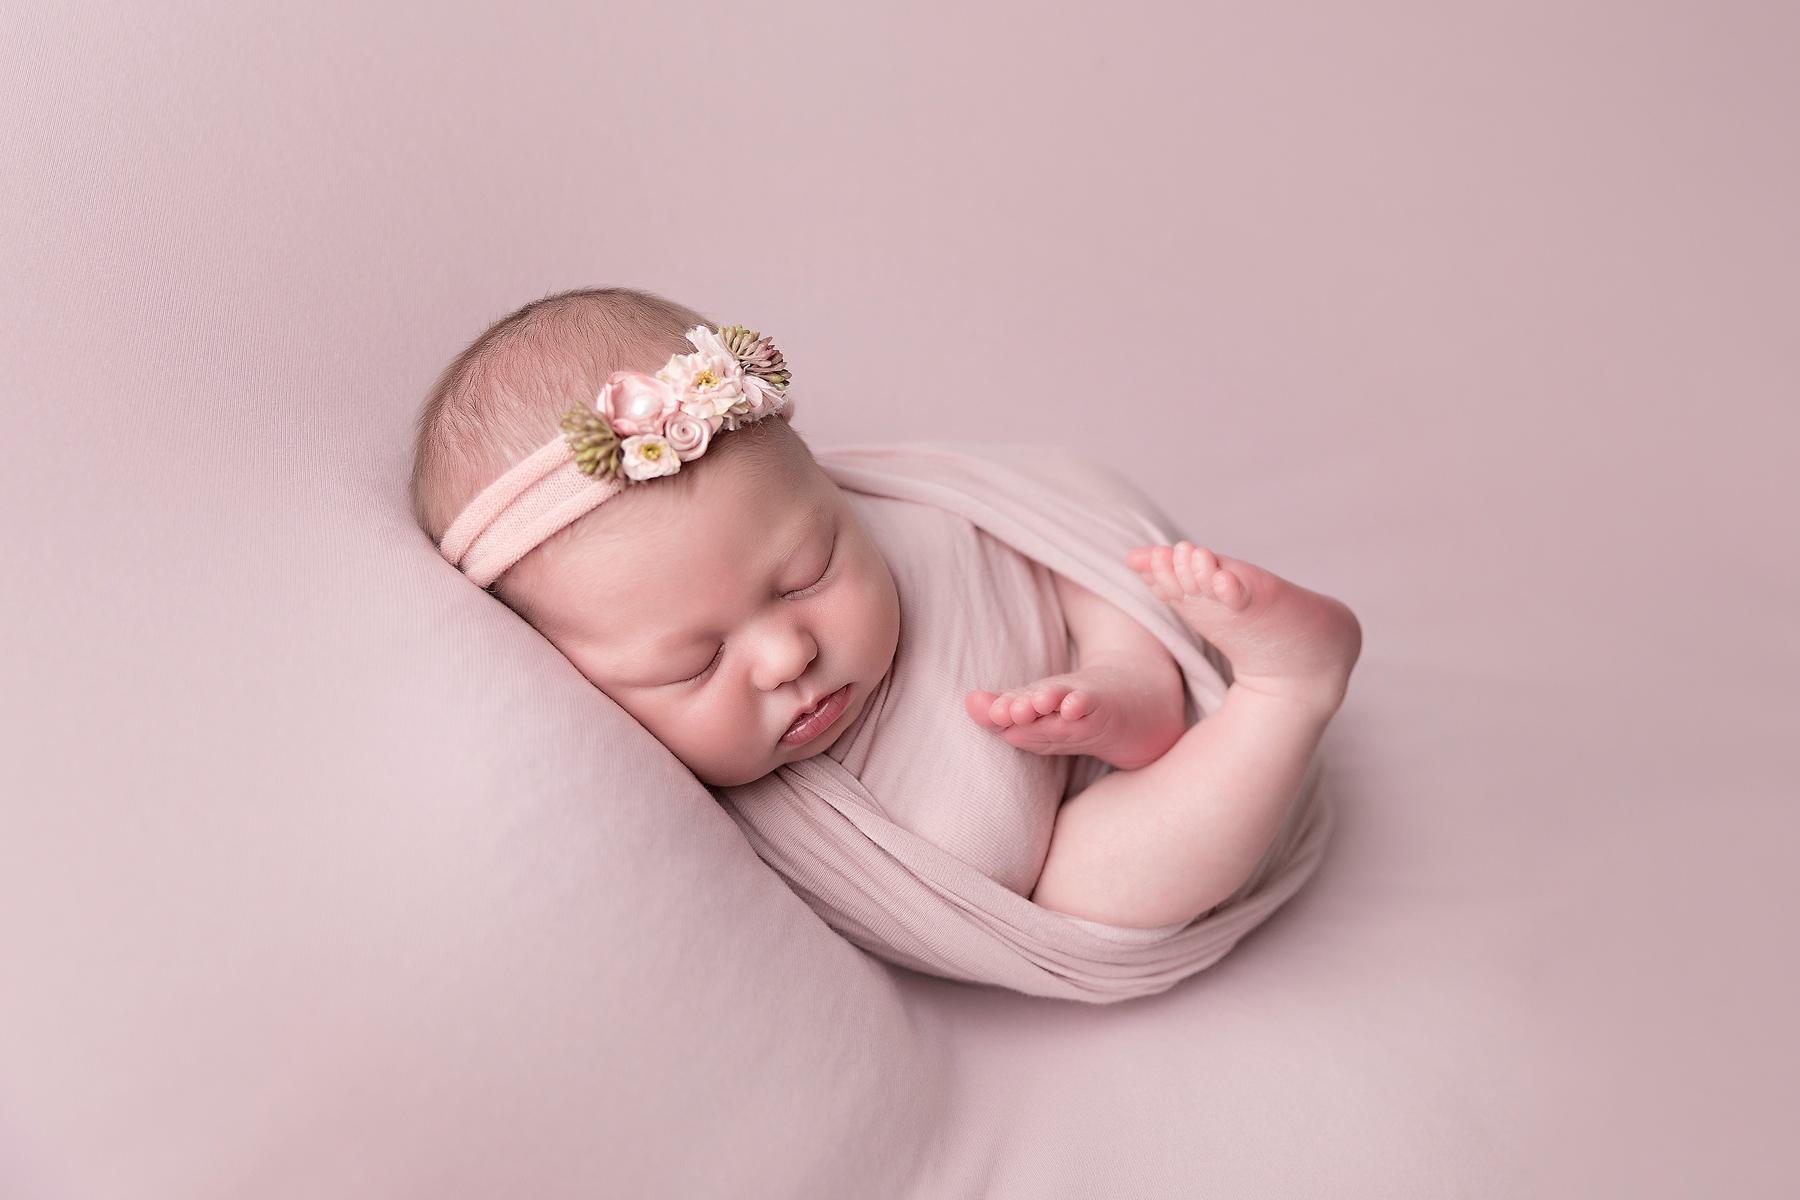 E20181219 - Kimberly MacDonald - Newborn